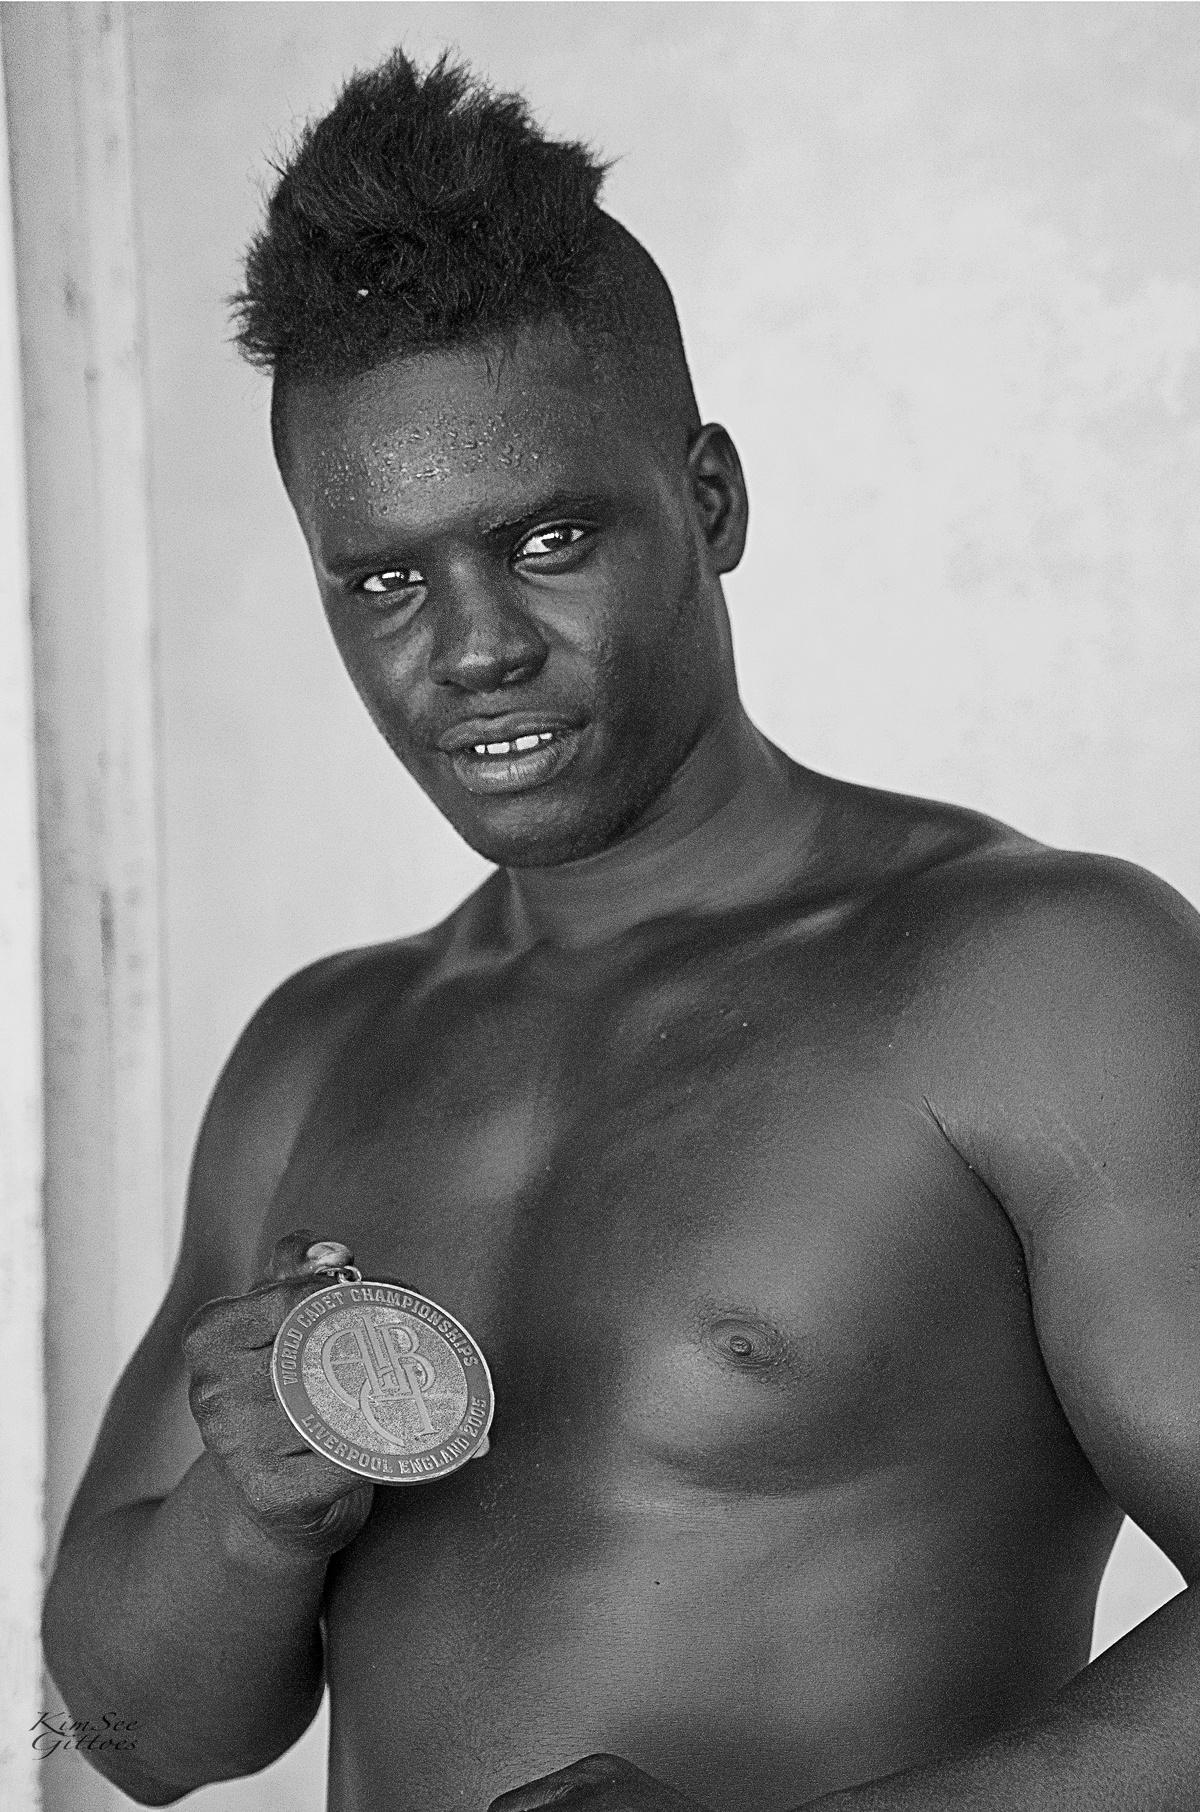 Cuban Boxer Champion by KimSee